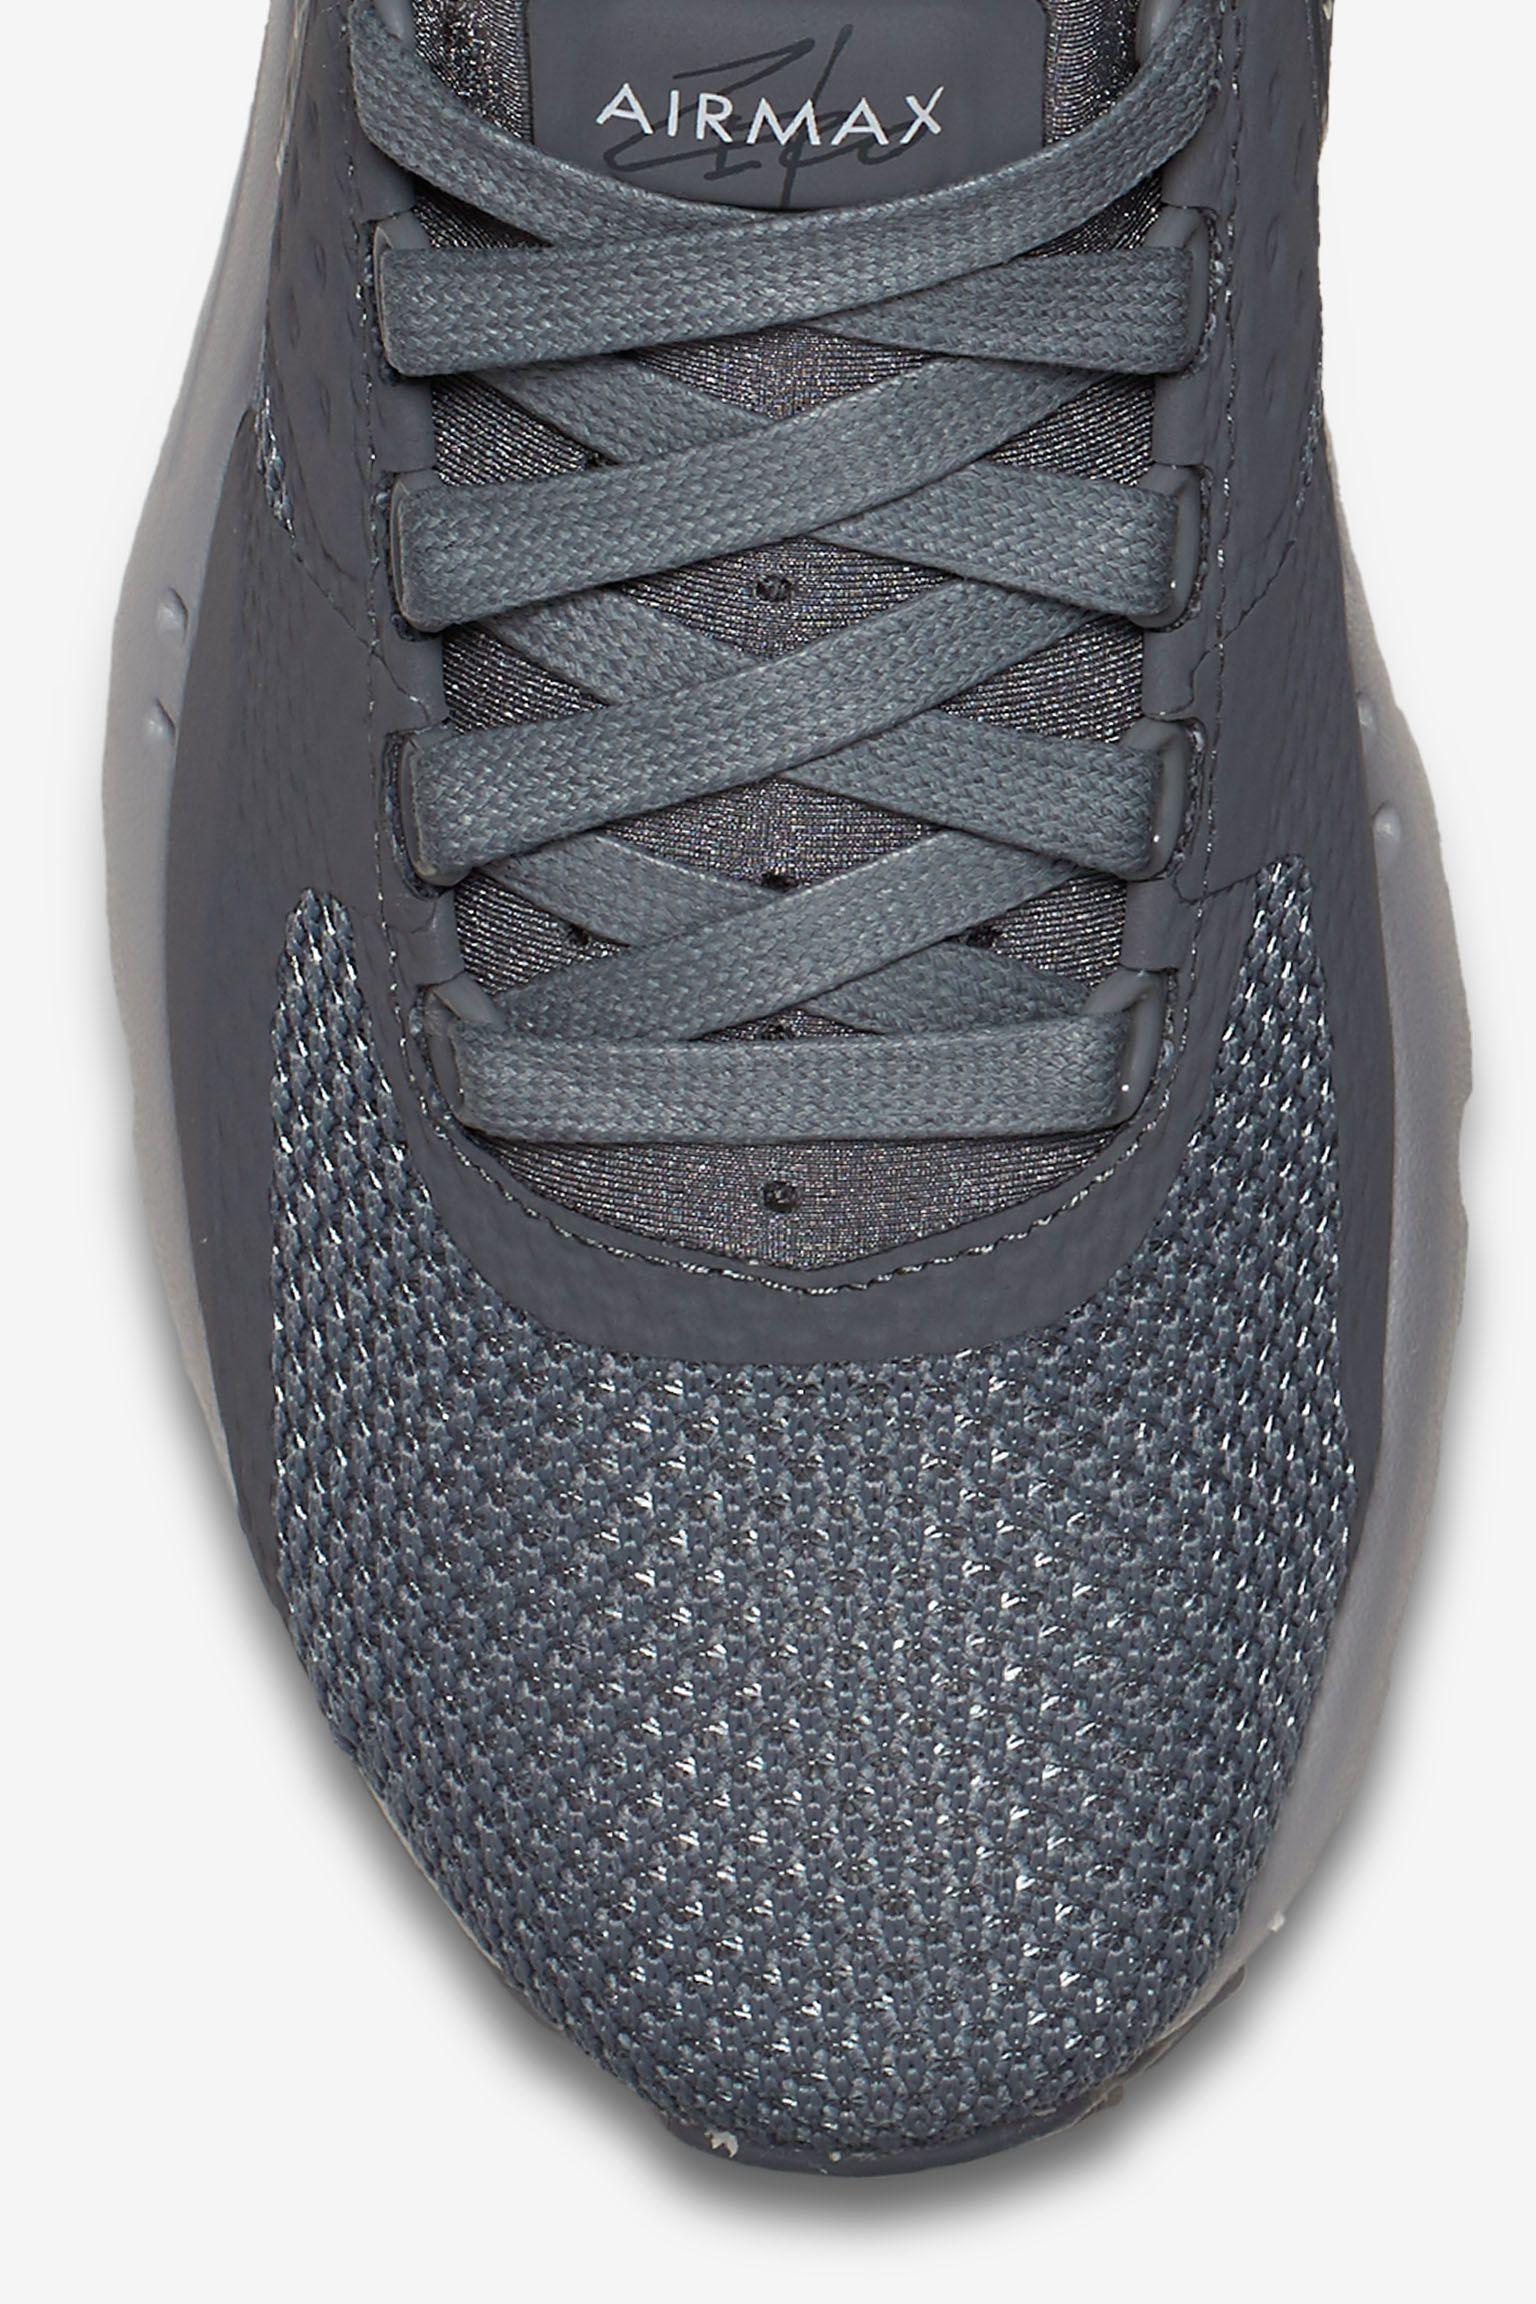 Nike Air Max Zero 'Cool Grey' Release Date